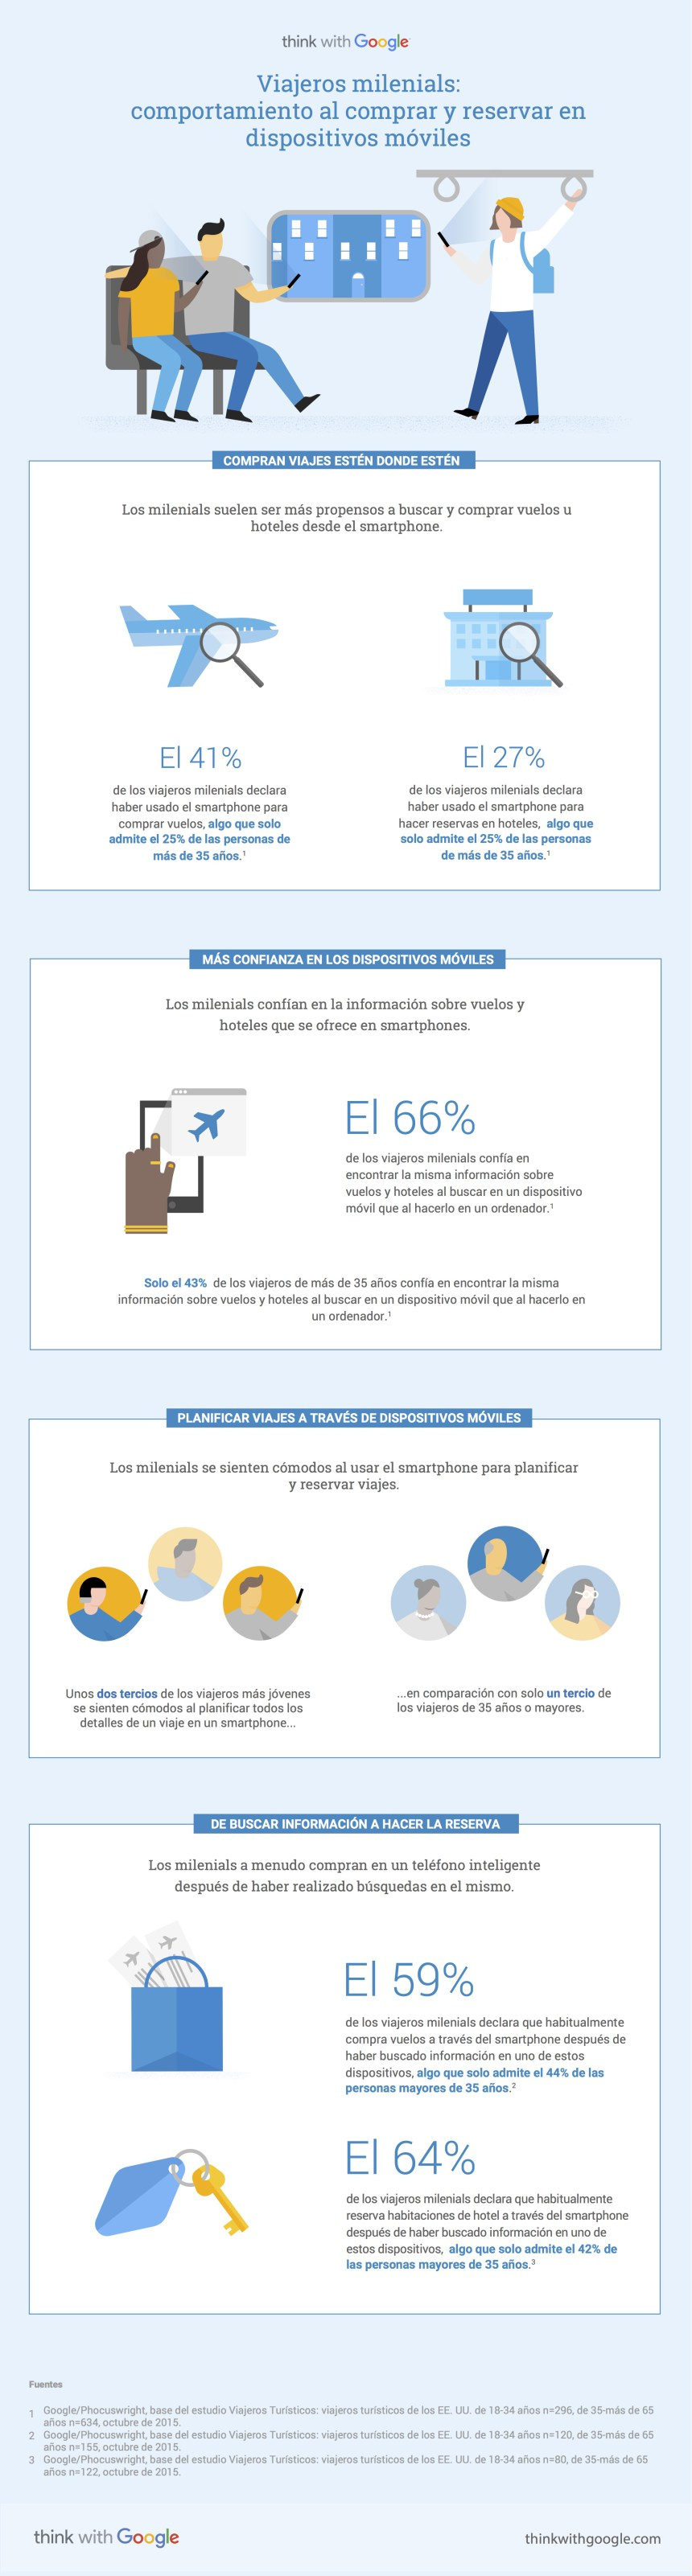 Viajeros millenials: compra y reserva en dispositivos móviles #infografia #infographic #tourism